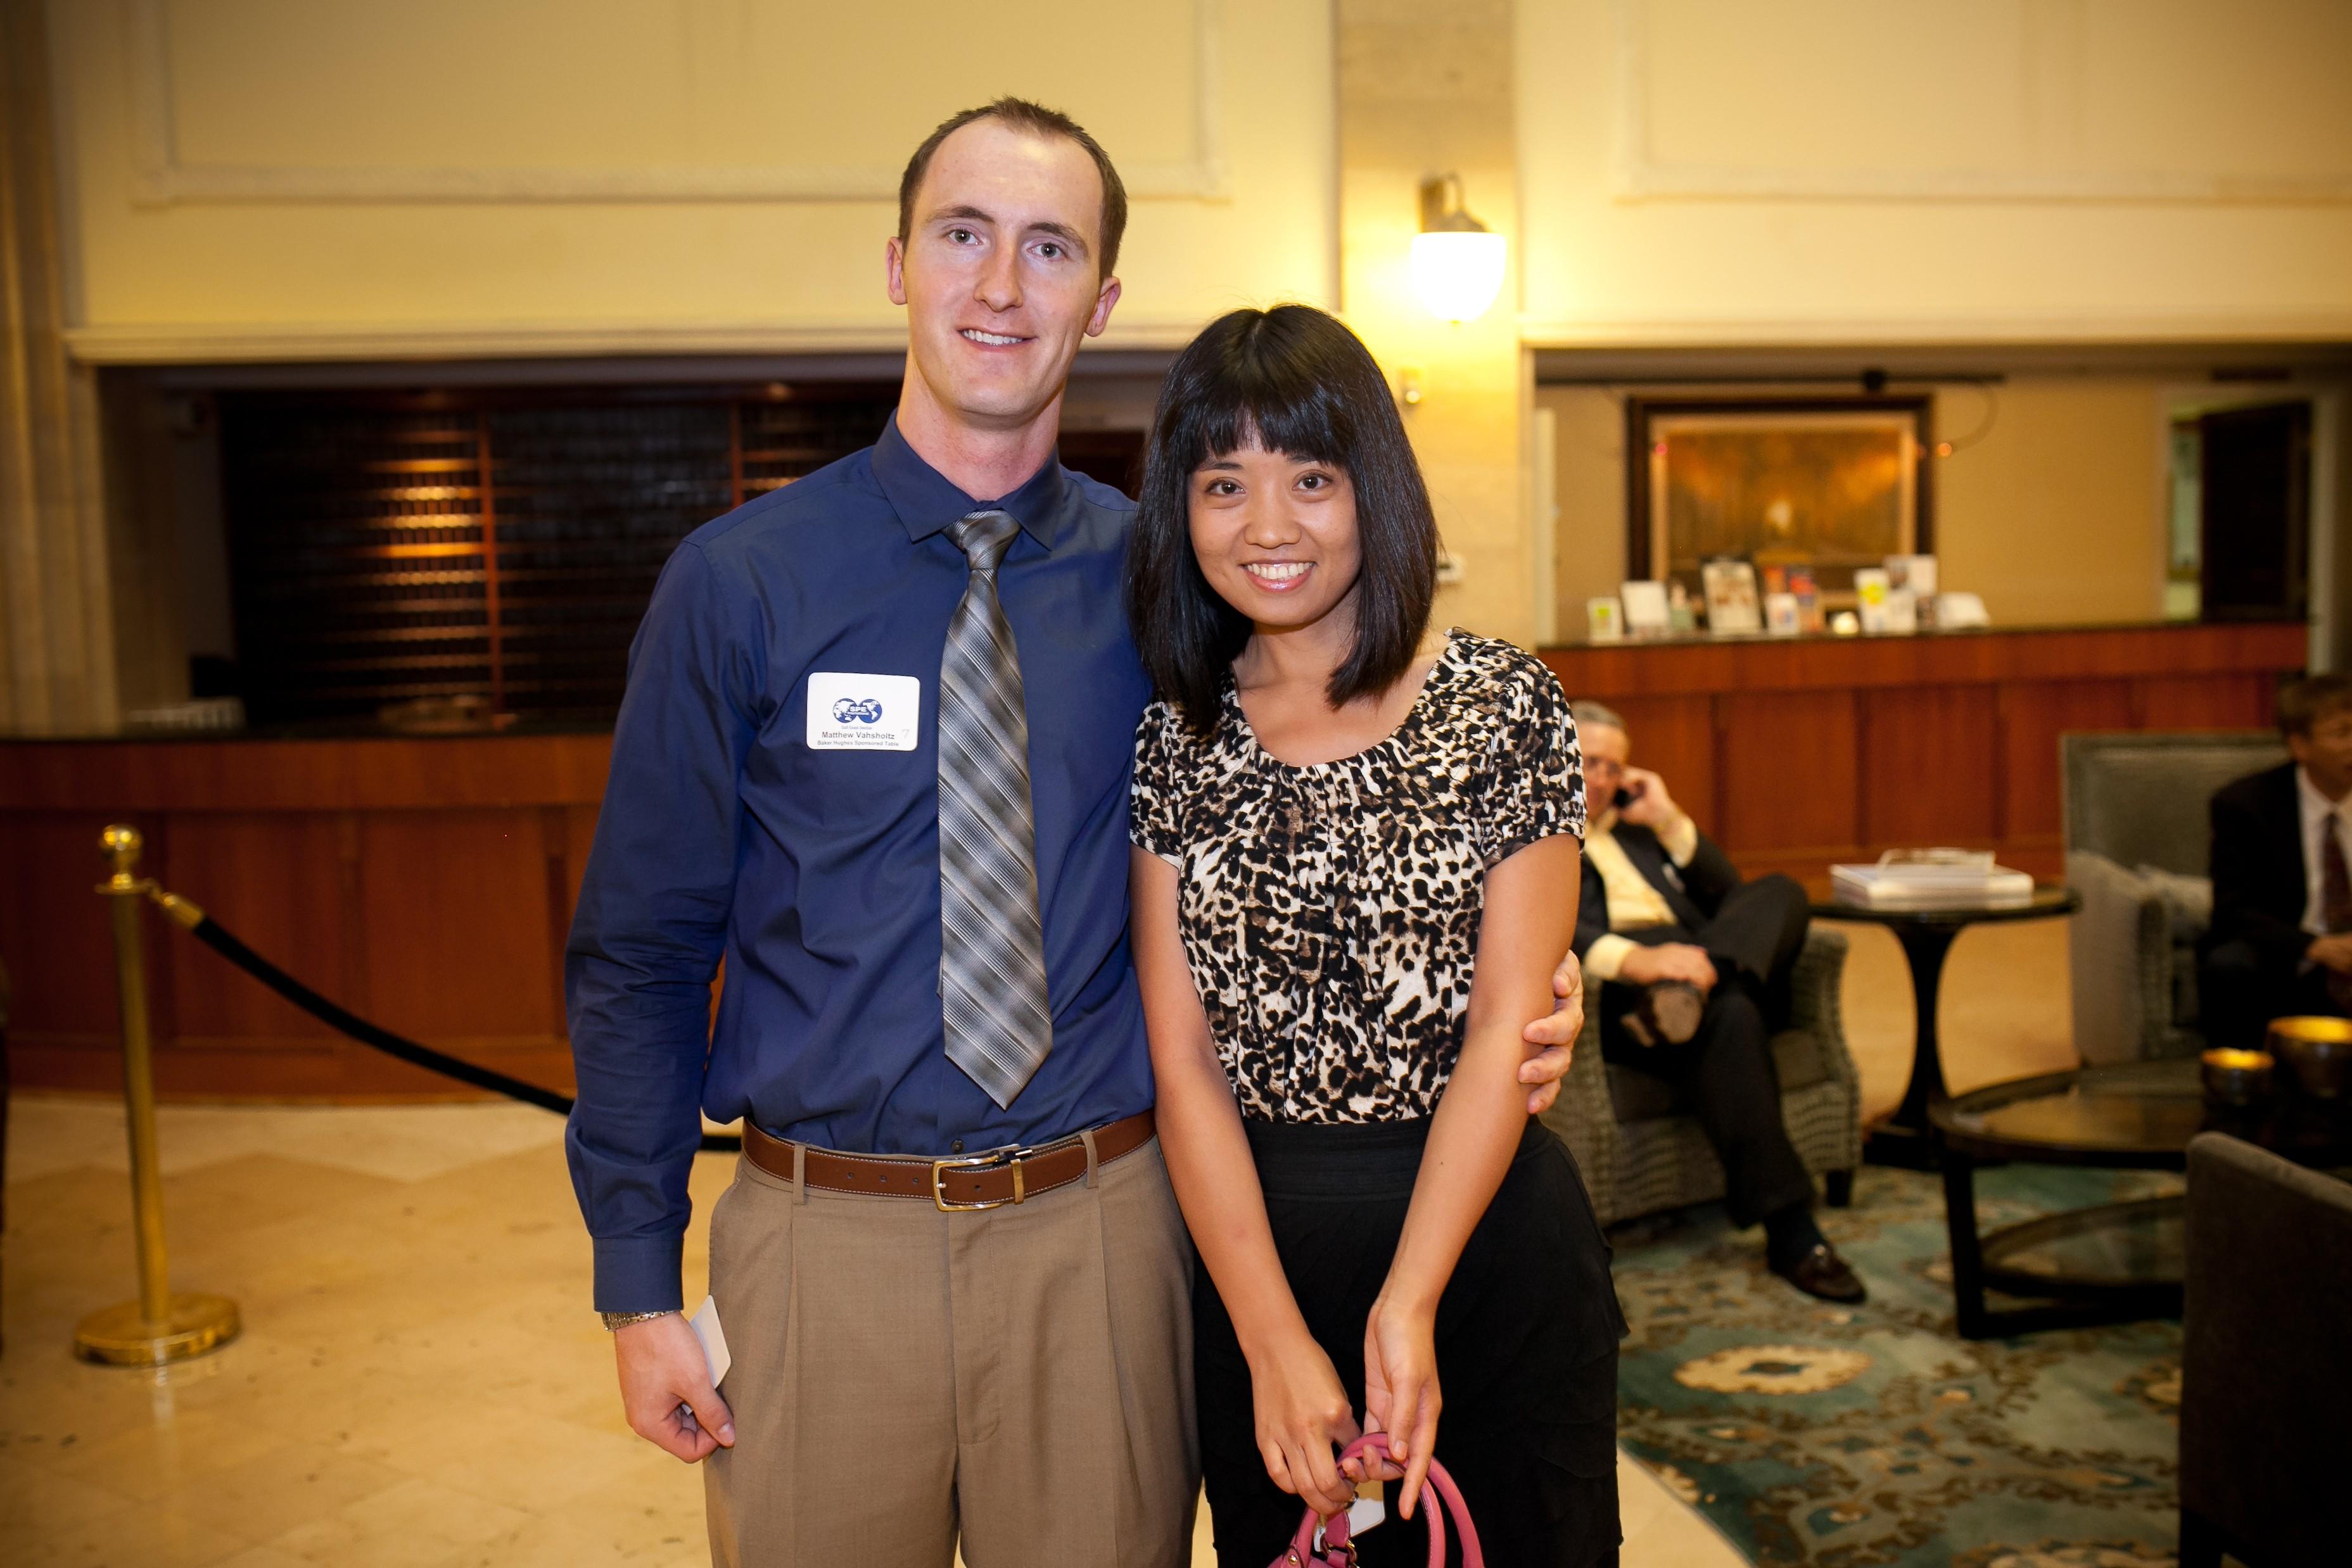 SPE-GCS Annual Awards Banquet